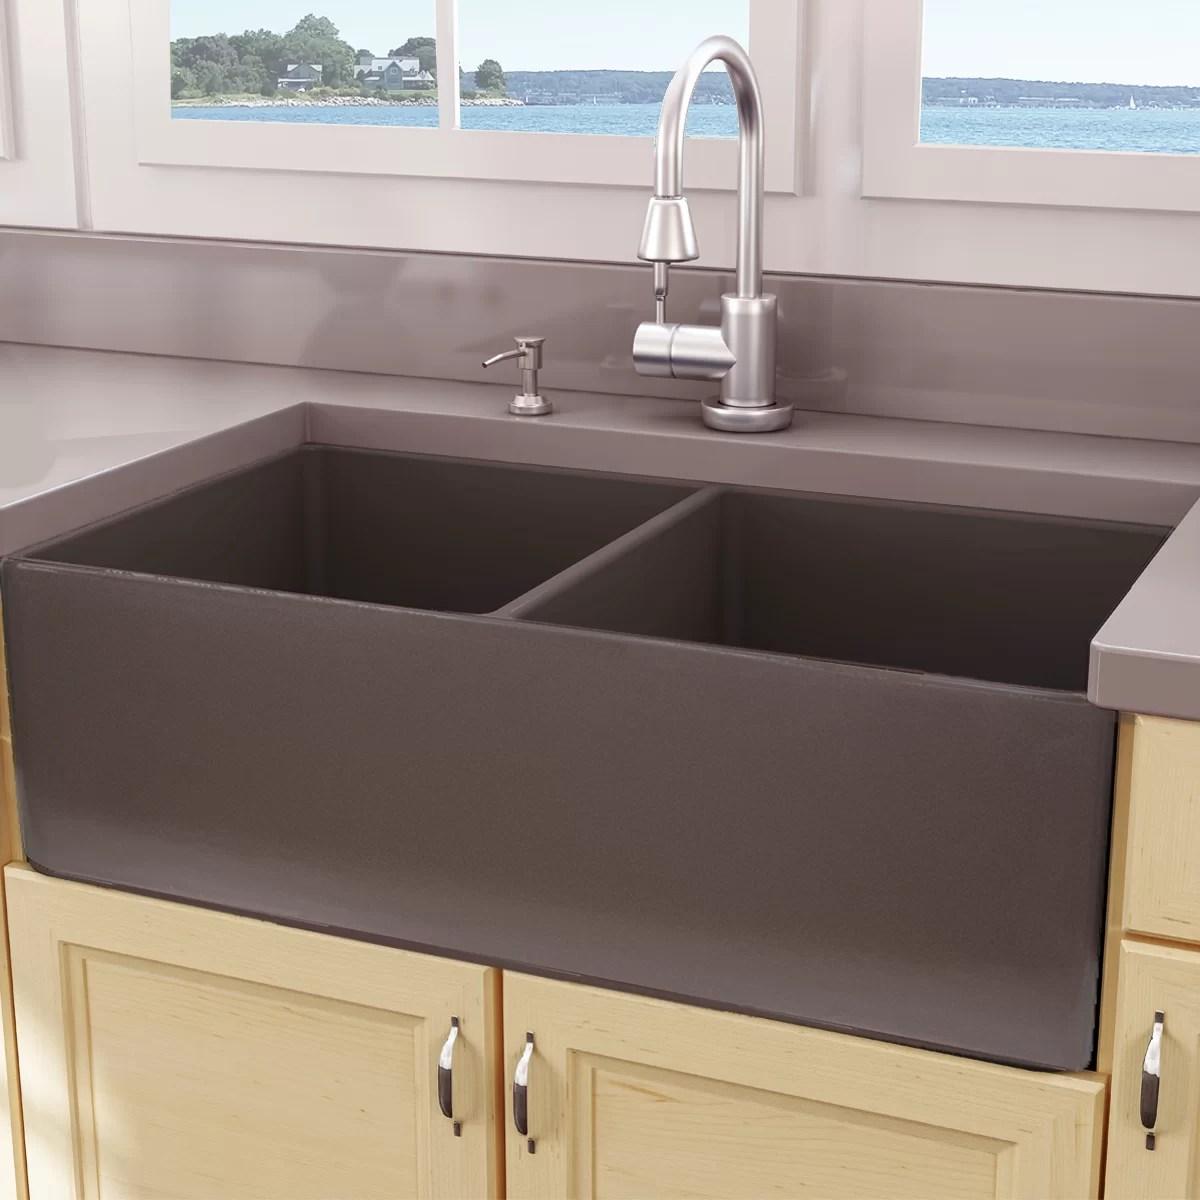 Nantucket Sinks Cape 33 L X 18 W Double Basin Farmhouse Apron Kitchen Sink Reviews Wayfair